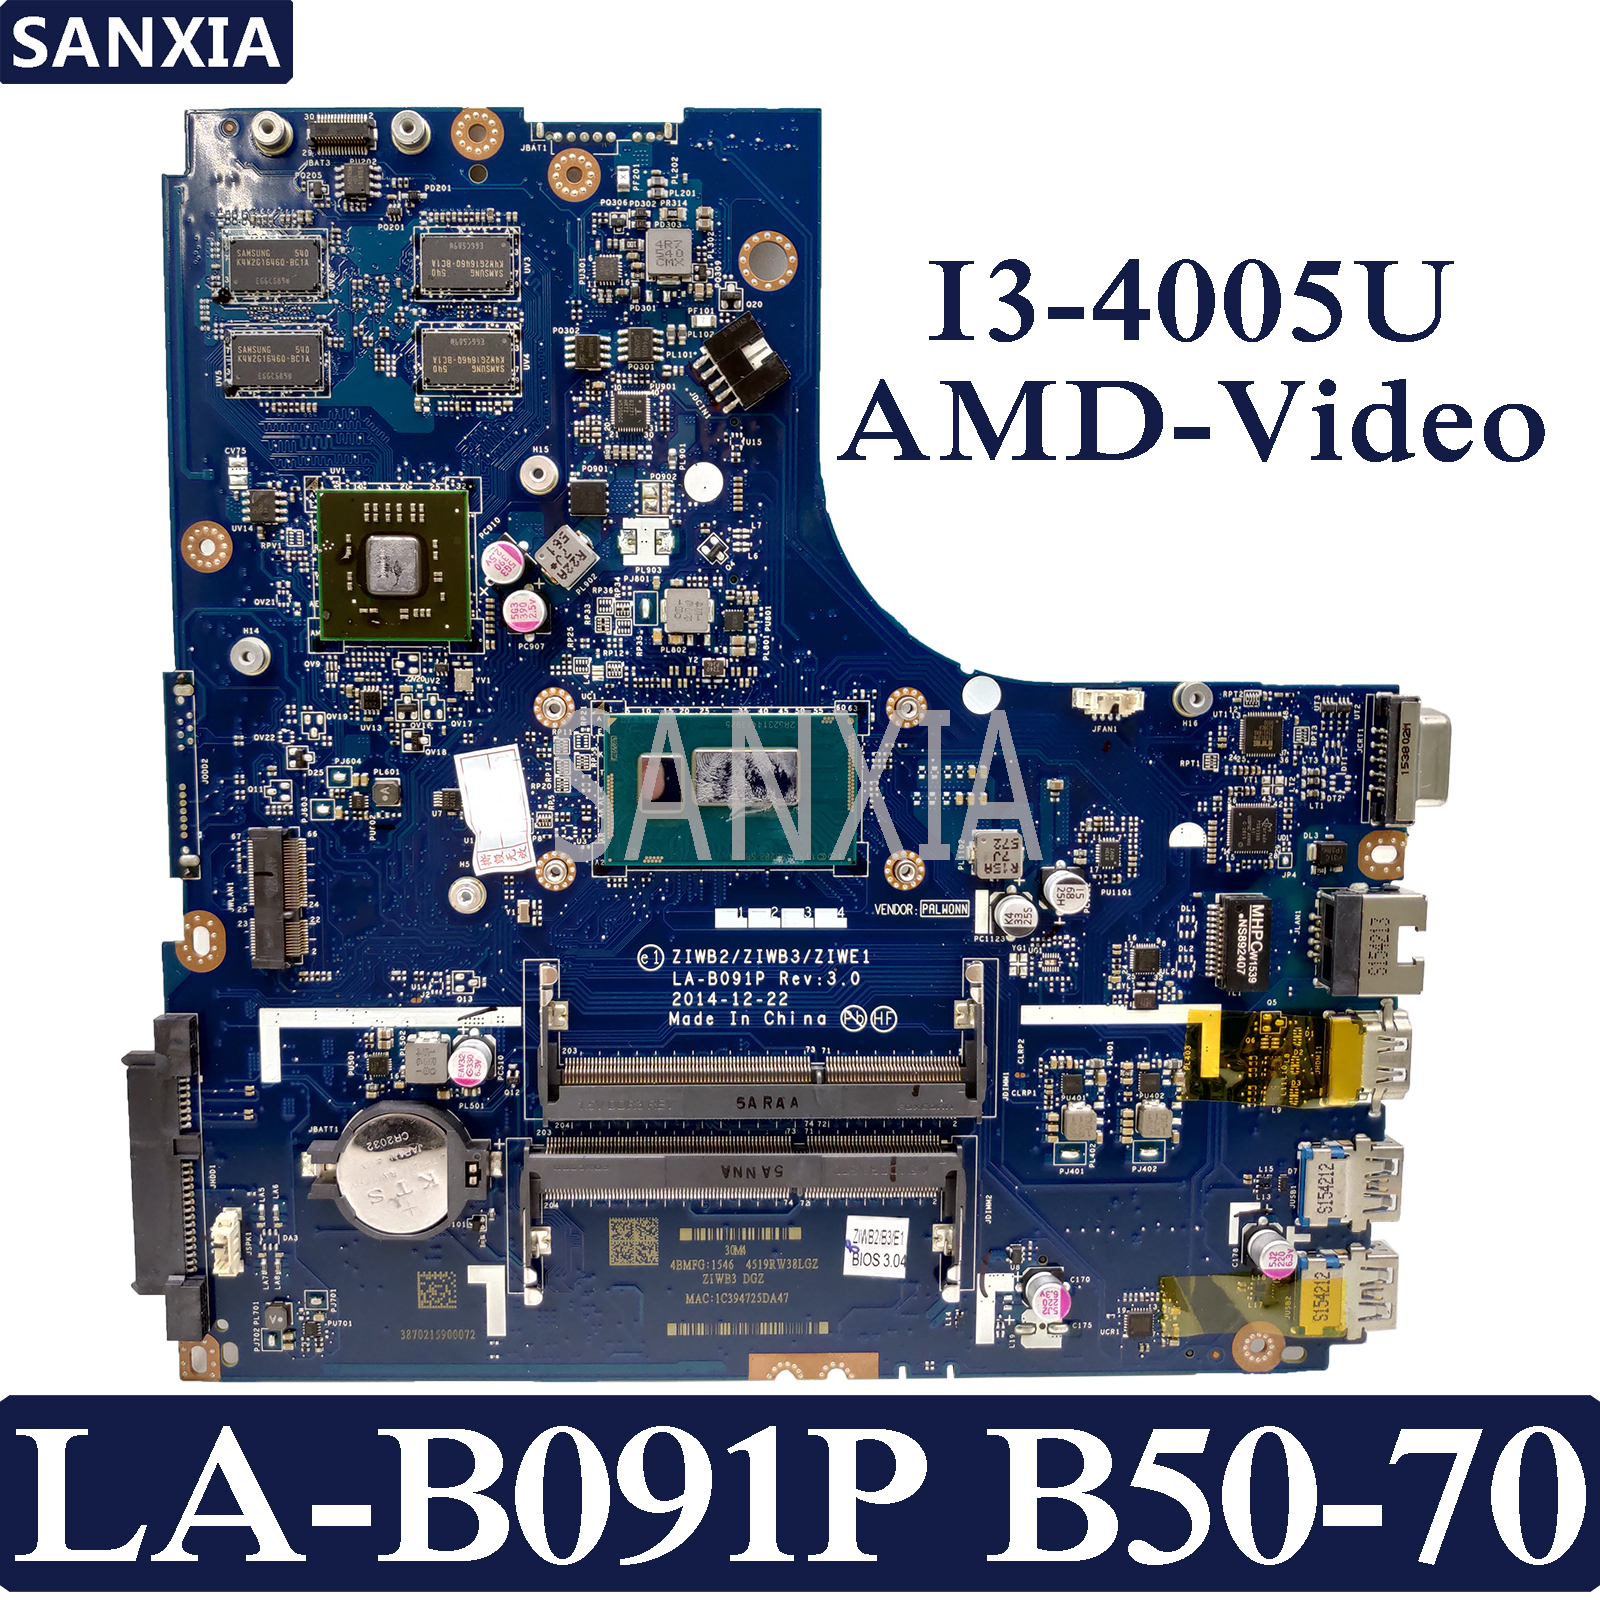 KEFU ZIWB2/ZIWB3/ZIWE1 LA-B091P Laptop motherboard for Lenovo B50-70 Test original mainboard I7-4500U AMD-VideoKEFU ZIWB2/ZIWB3/ZIWE1 LA-B091P Laptop motherboard for Lenovo B50-70 Test original mainboard I7-4500U AMD-Video